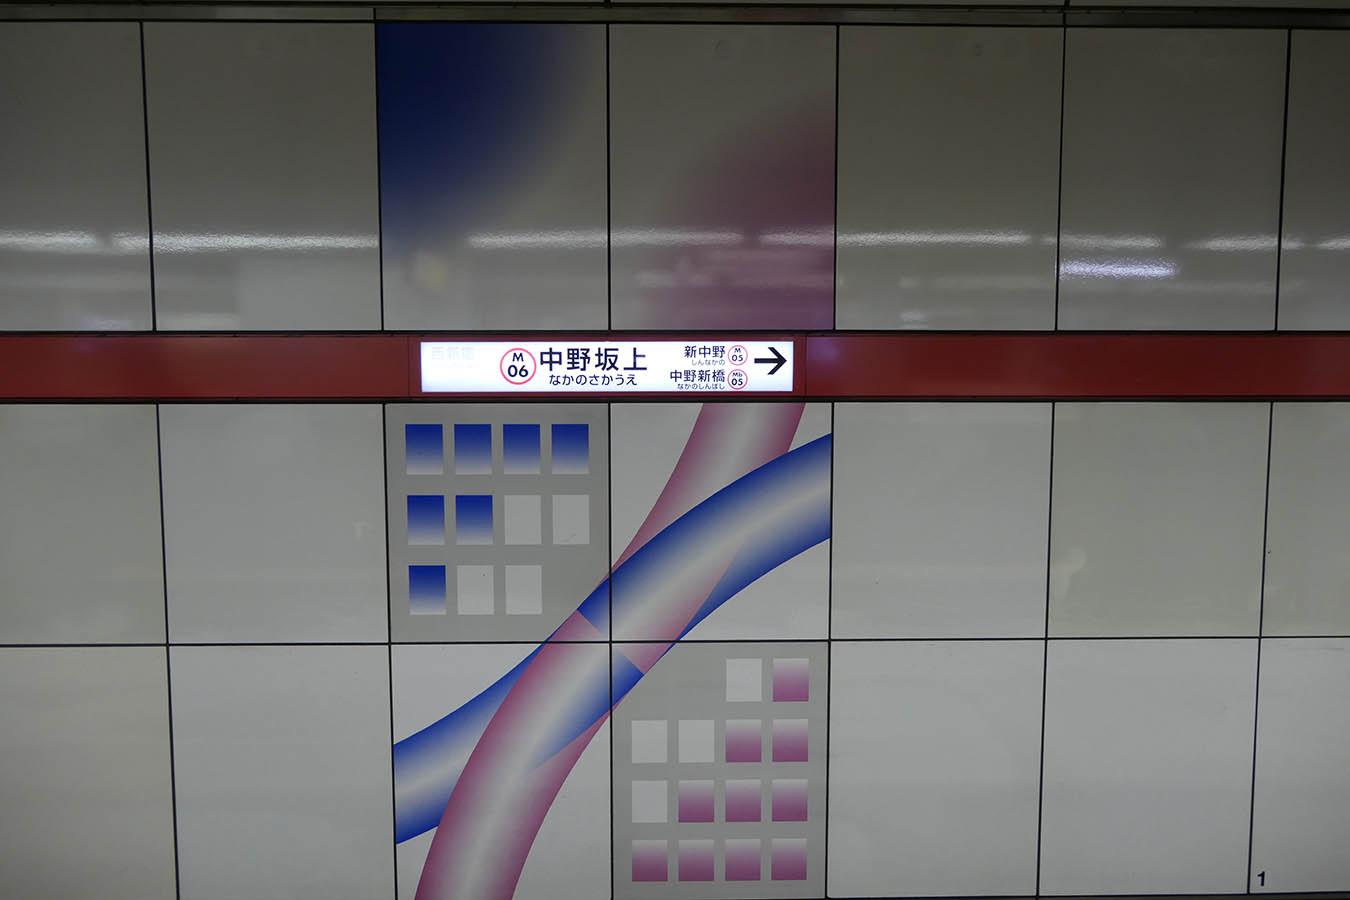 M06_photo07d.jpg